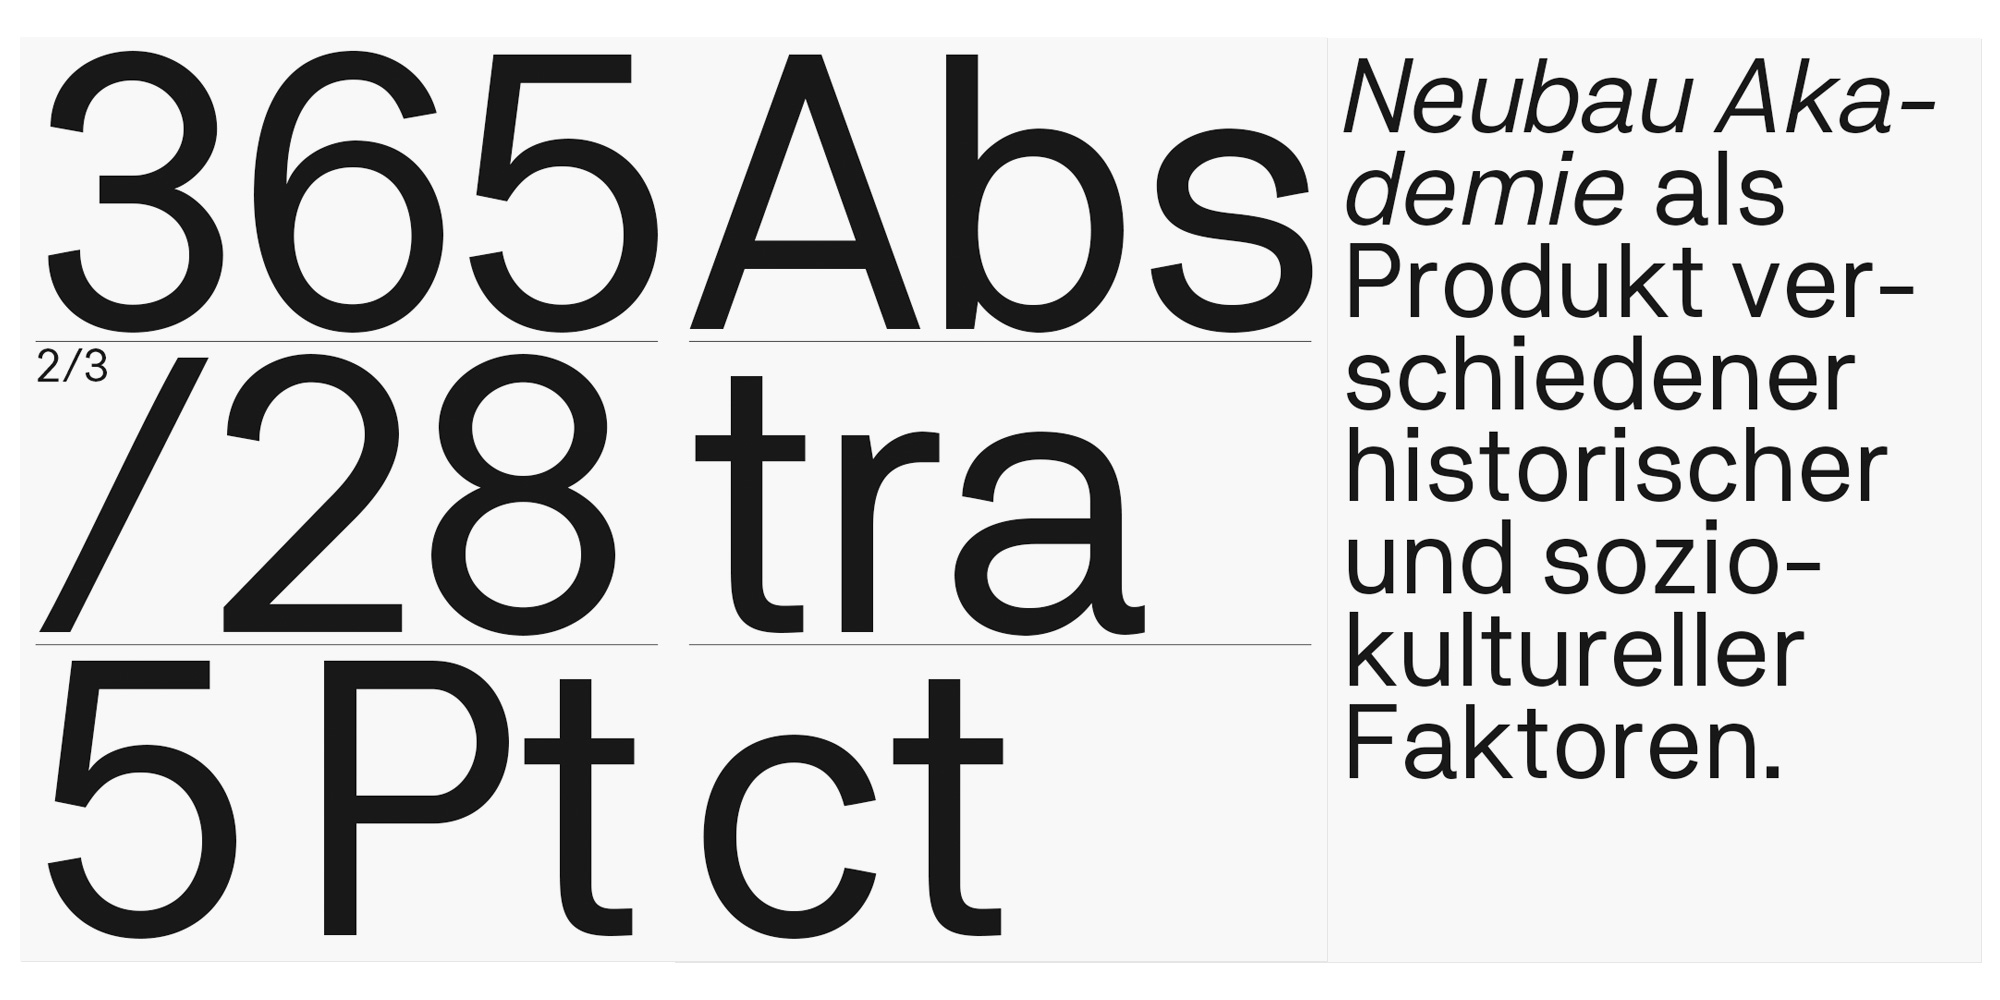 NBL_AKA_SLIDE_HIST_1